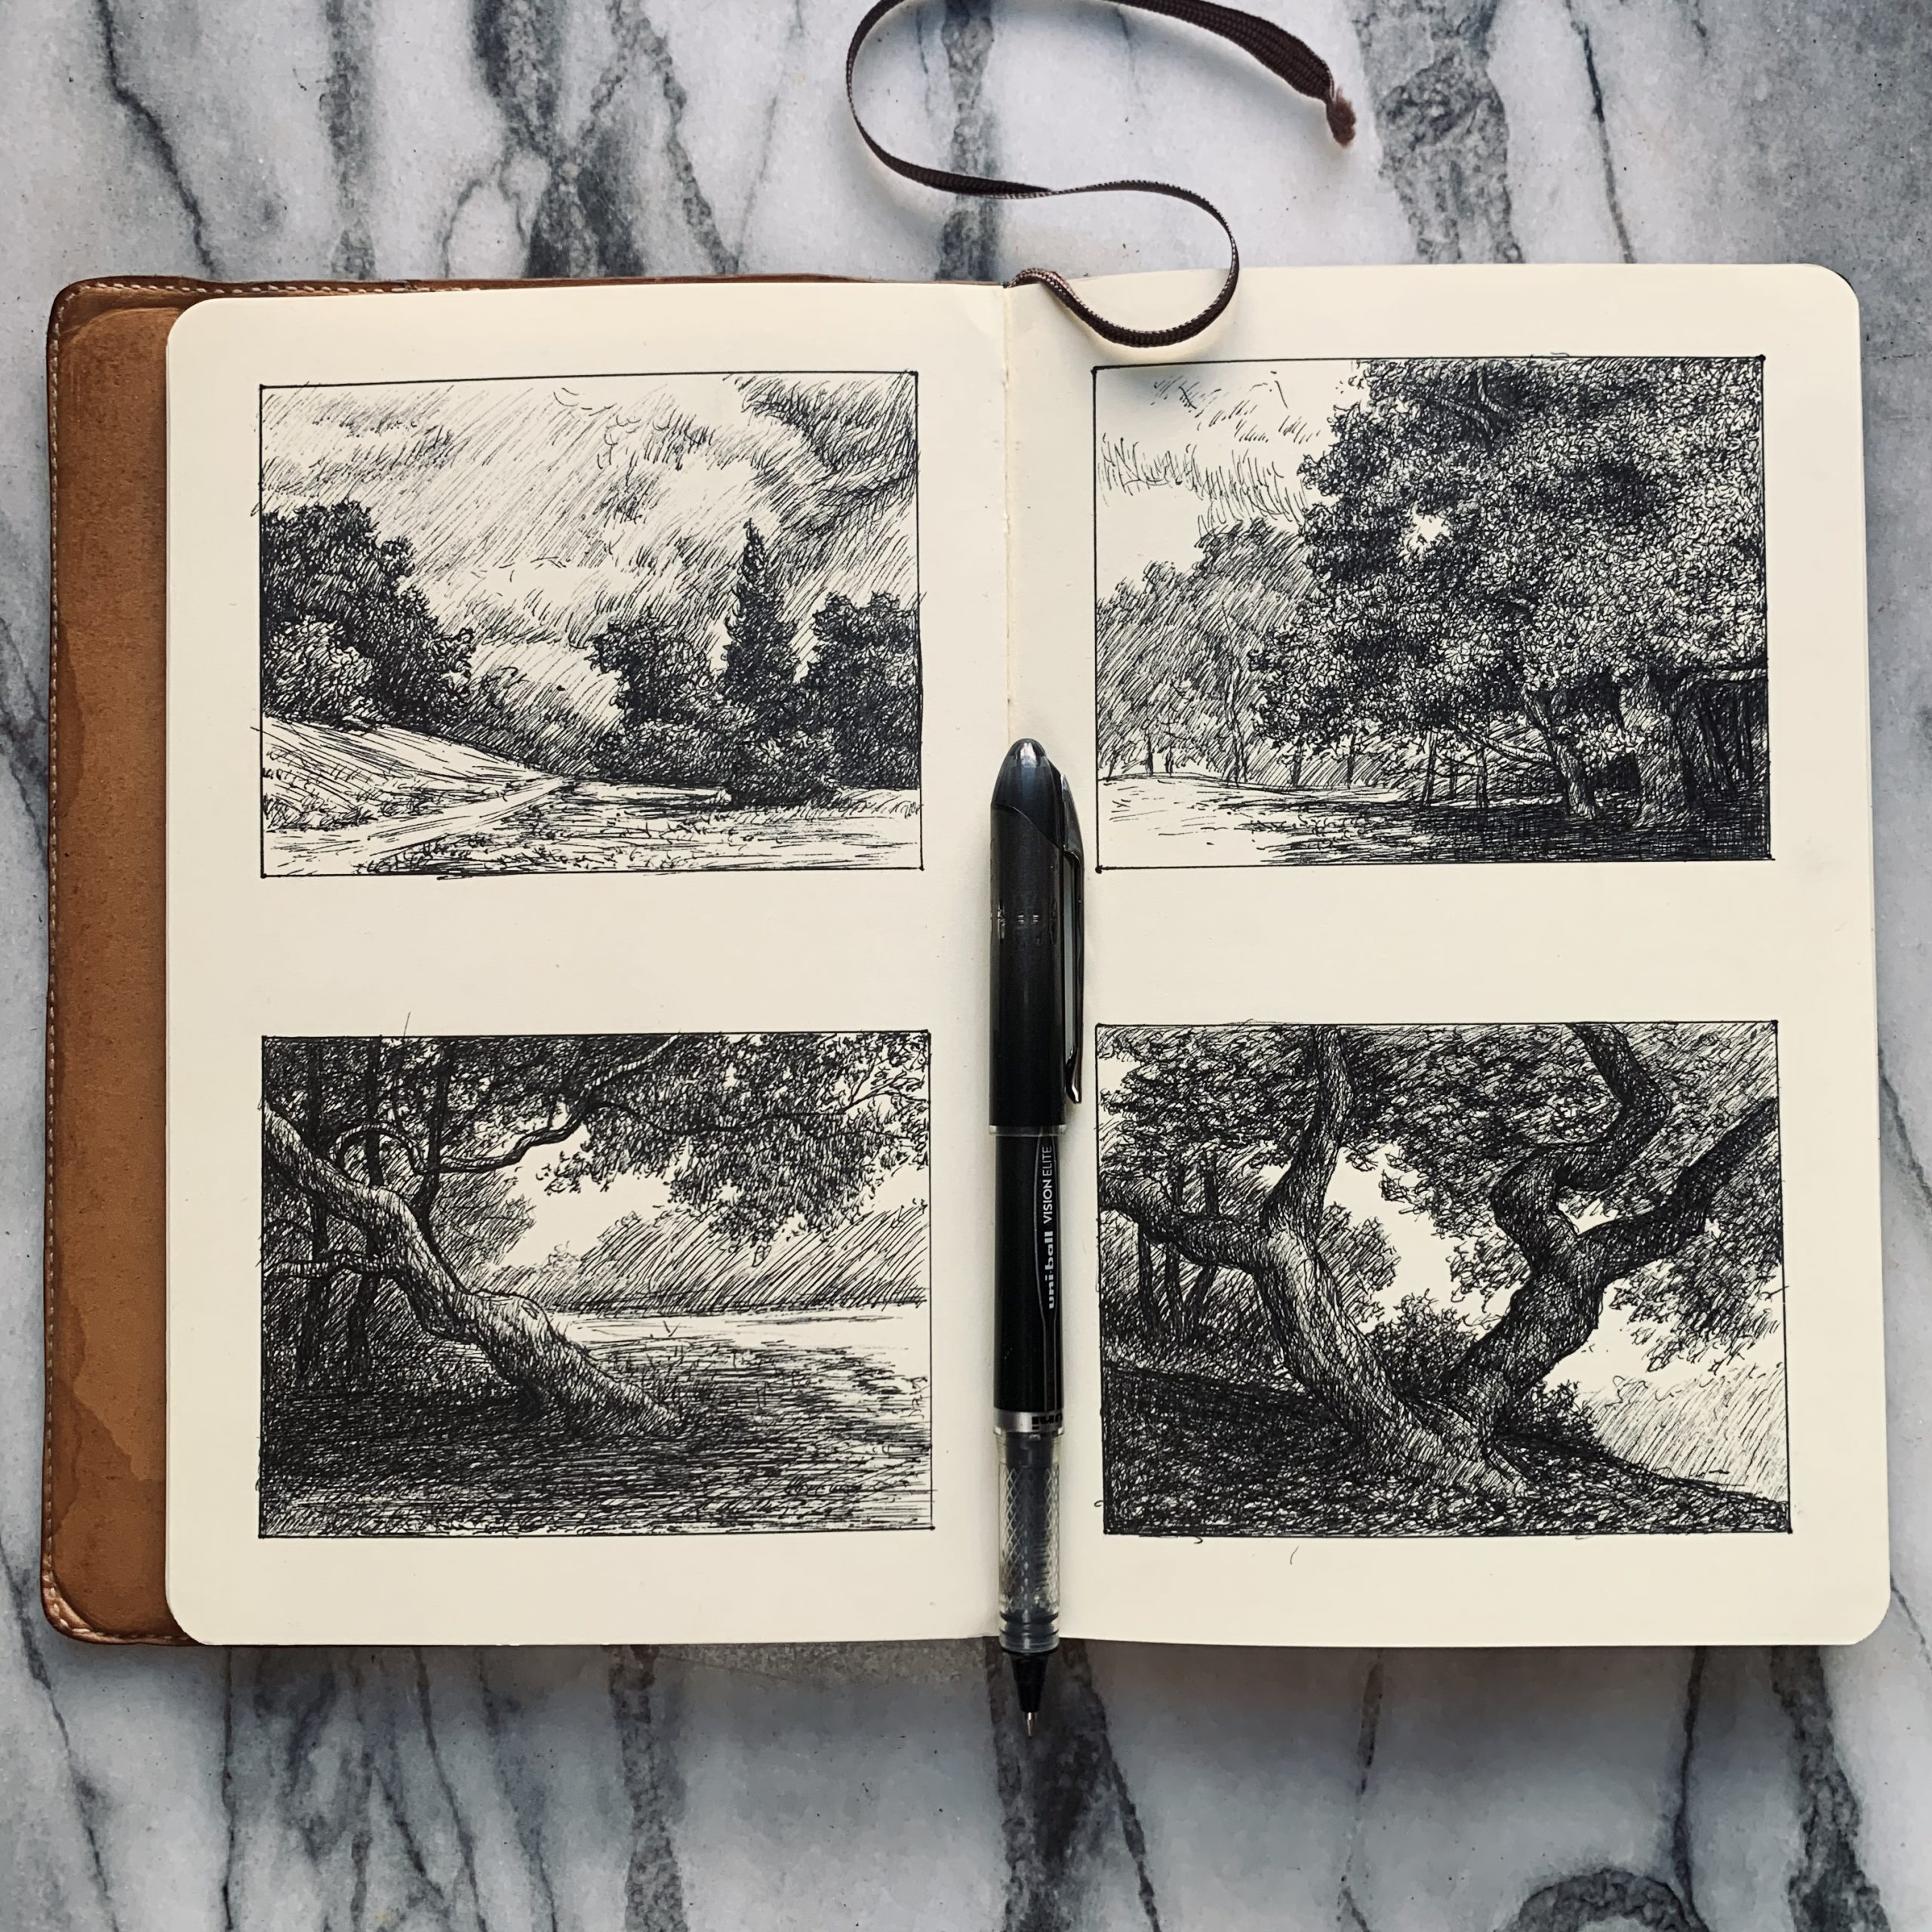 Thumbnail sketchers